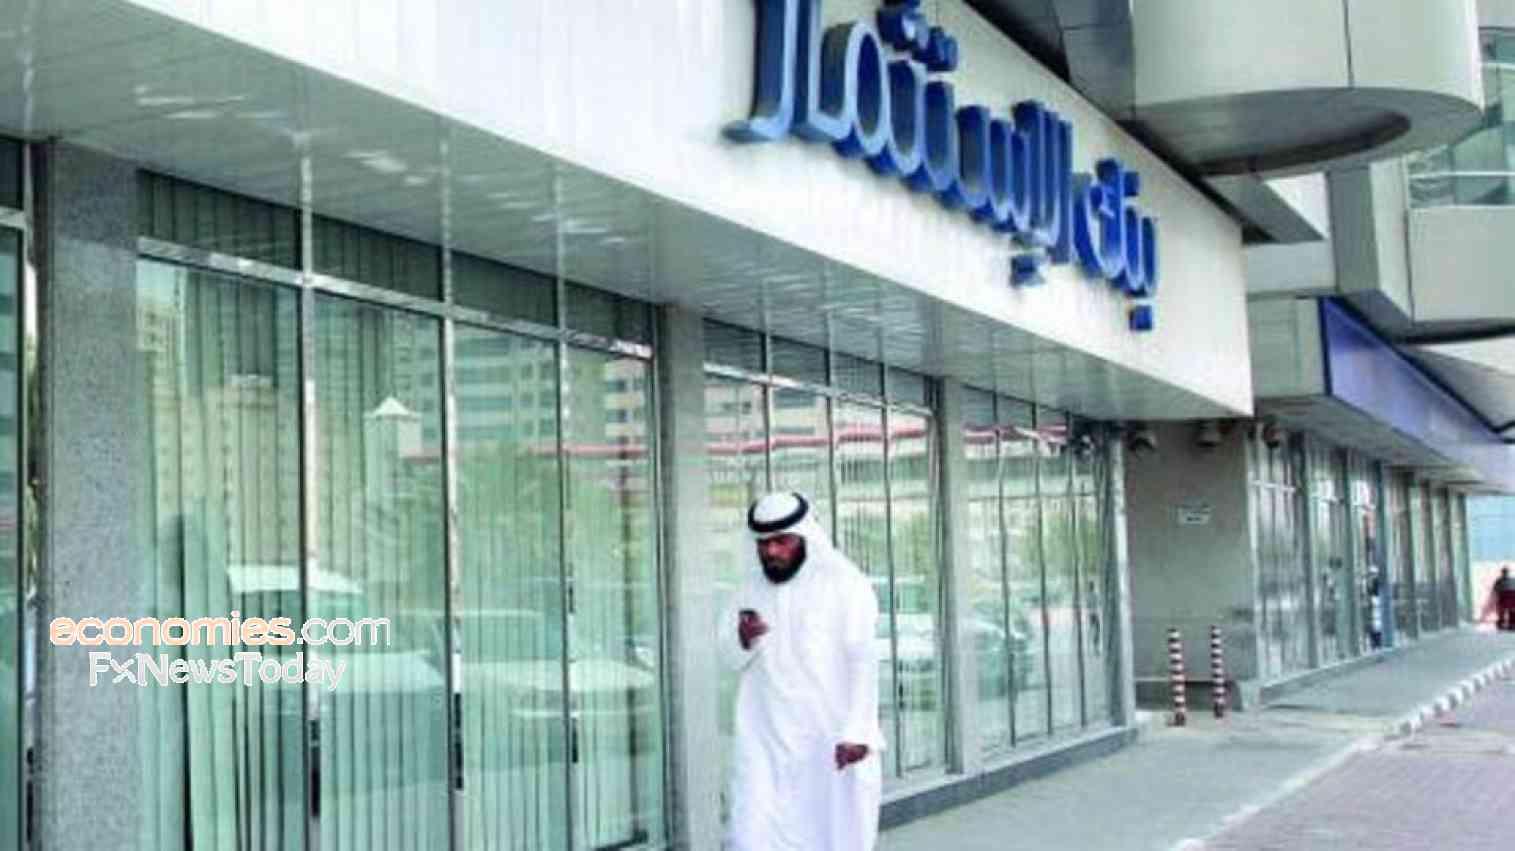 SAIB posts 3.4% rise in full-year profit